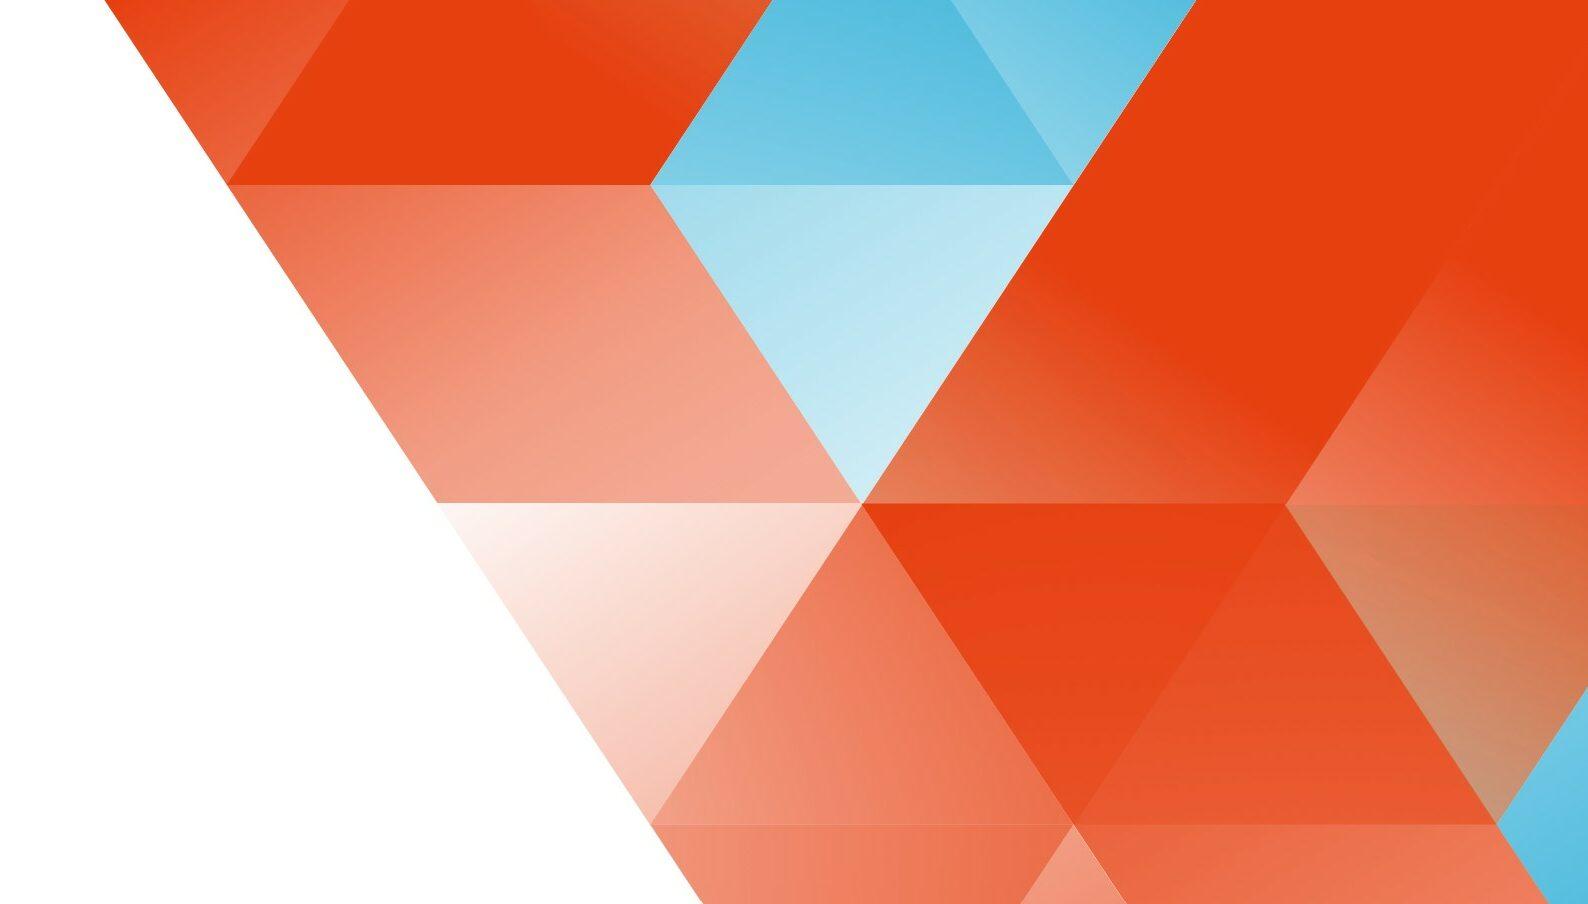 Viria Abp:s affärsöversikt 1.1–31.3.2021